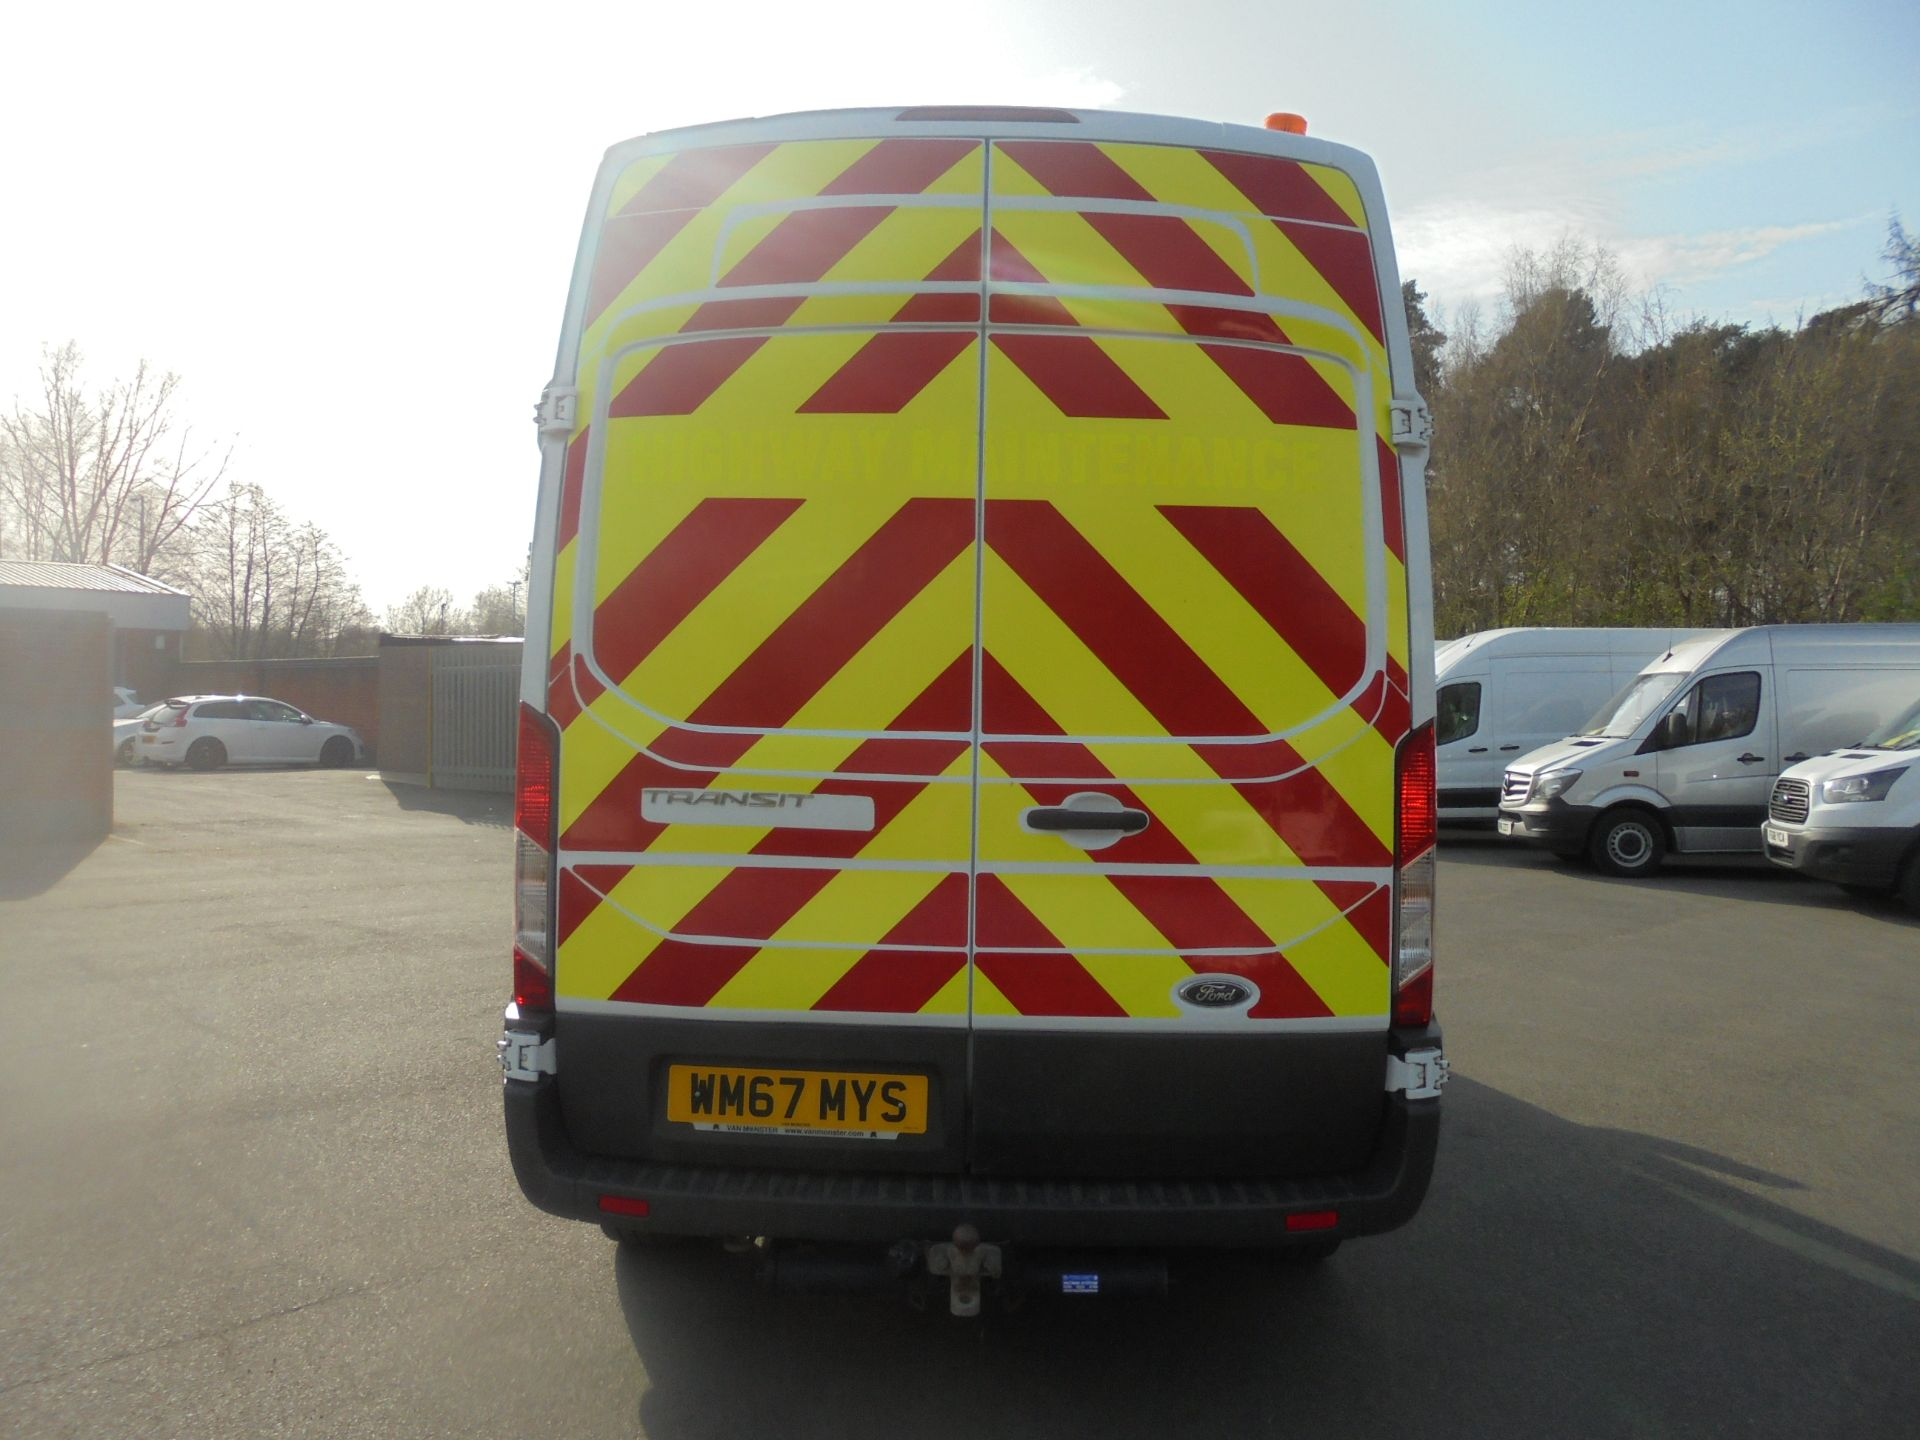 2018 Ford Transit 2.0 Tdci 130Ps H3 Van (WM67MYS) Image 8